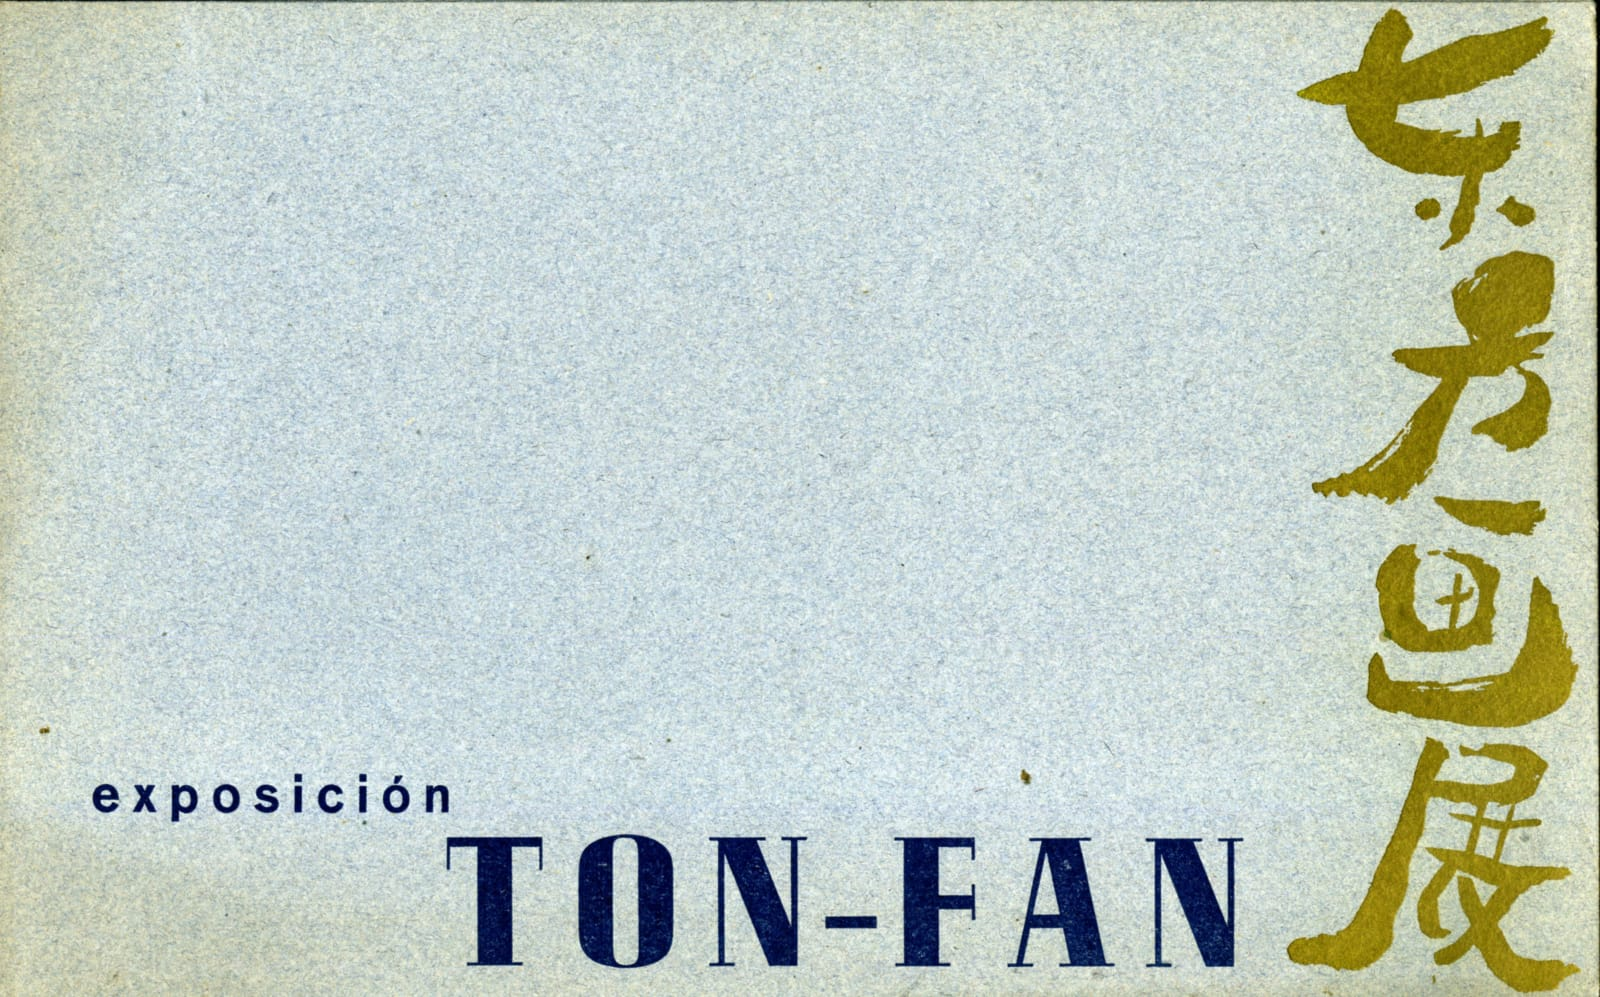 Nov-Dec 1958, Ton-Fan Painting Exhibition in Barcelona 1958年11月至12月於巴塞隆納舉辦「東方畫展」